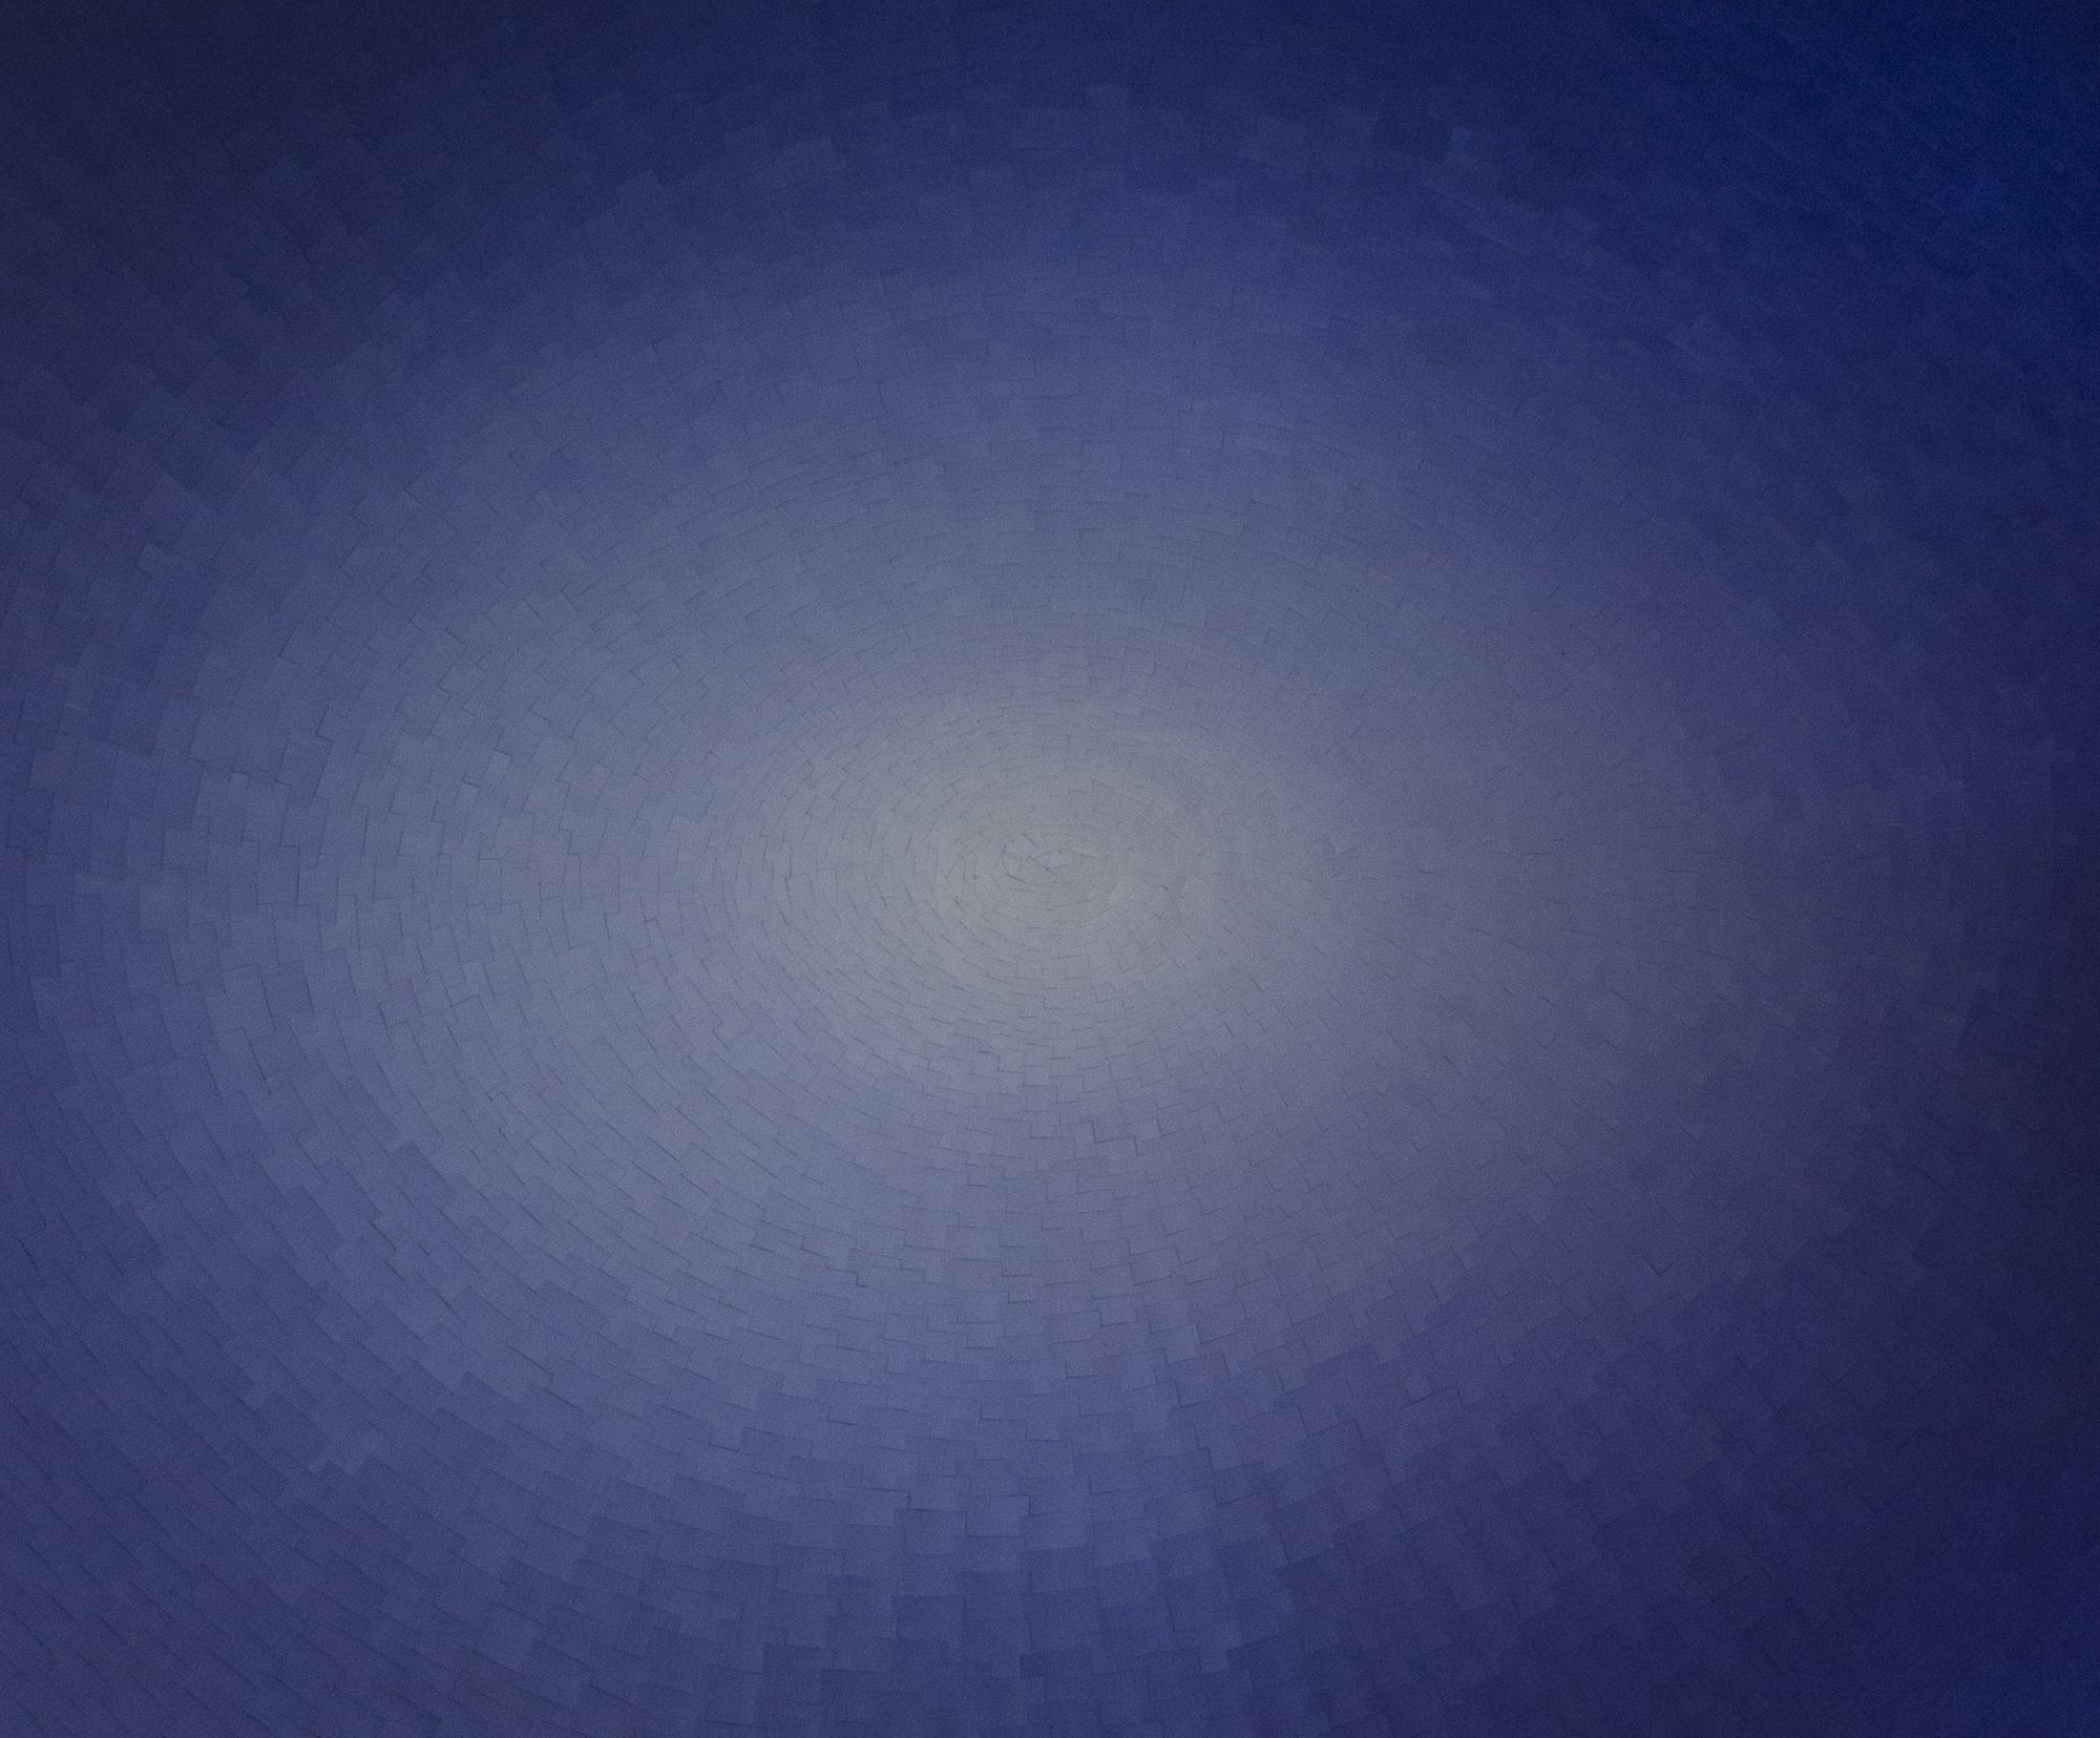 sphere 0718. Resin & Mixed Media 50 x 50 x 2 copy.jpg